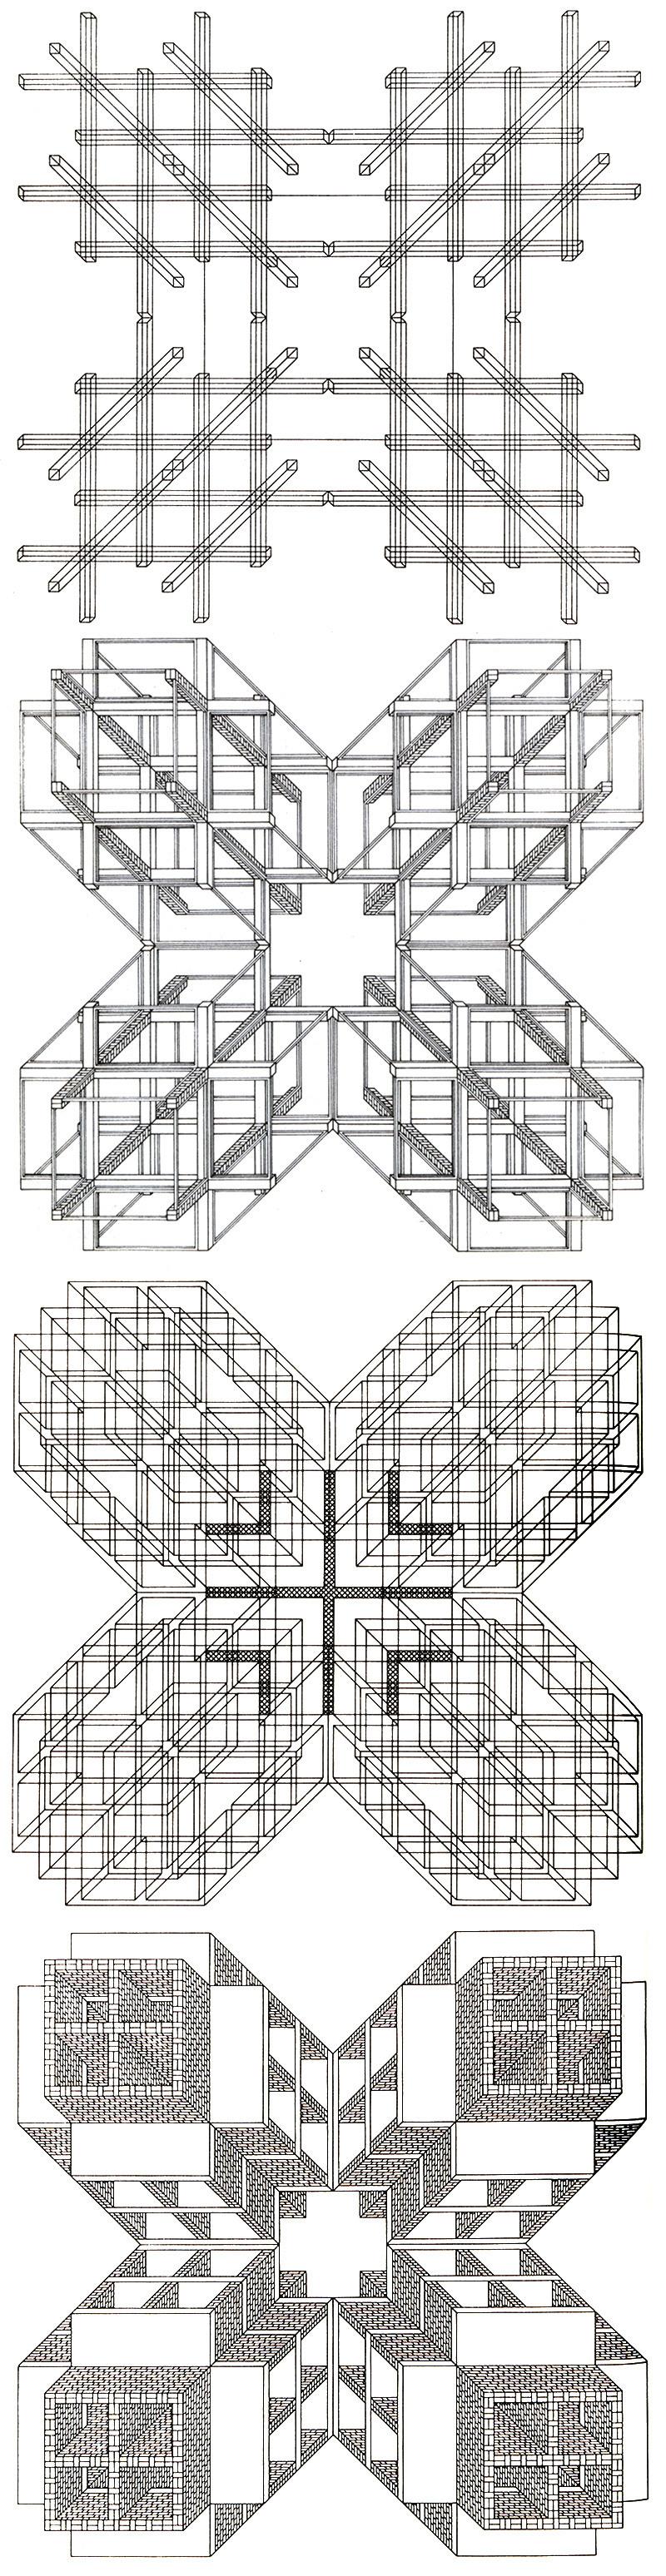 Anti Vitruv Super Brunelleschi On Wordpress Com Stanley Tigerman Architecture Drawings Blueprints